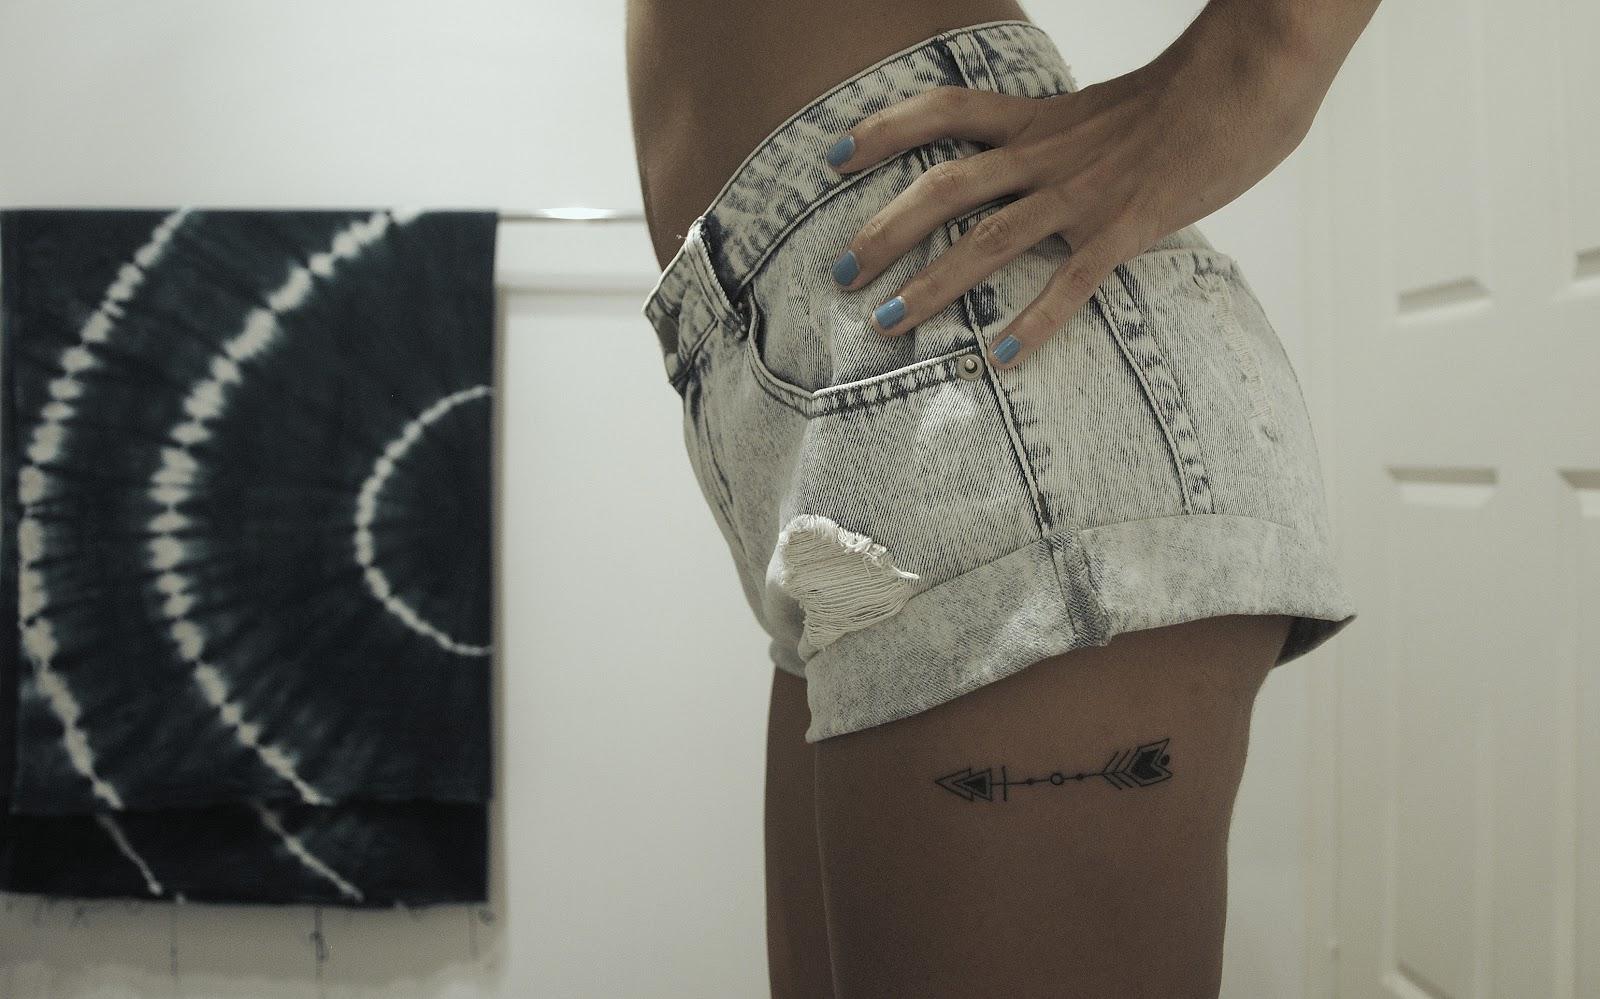 Populaire Arrow Tattoo IM57